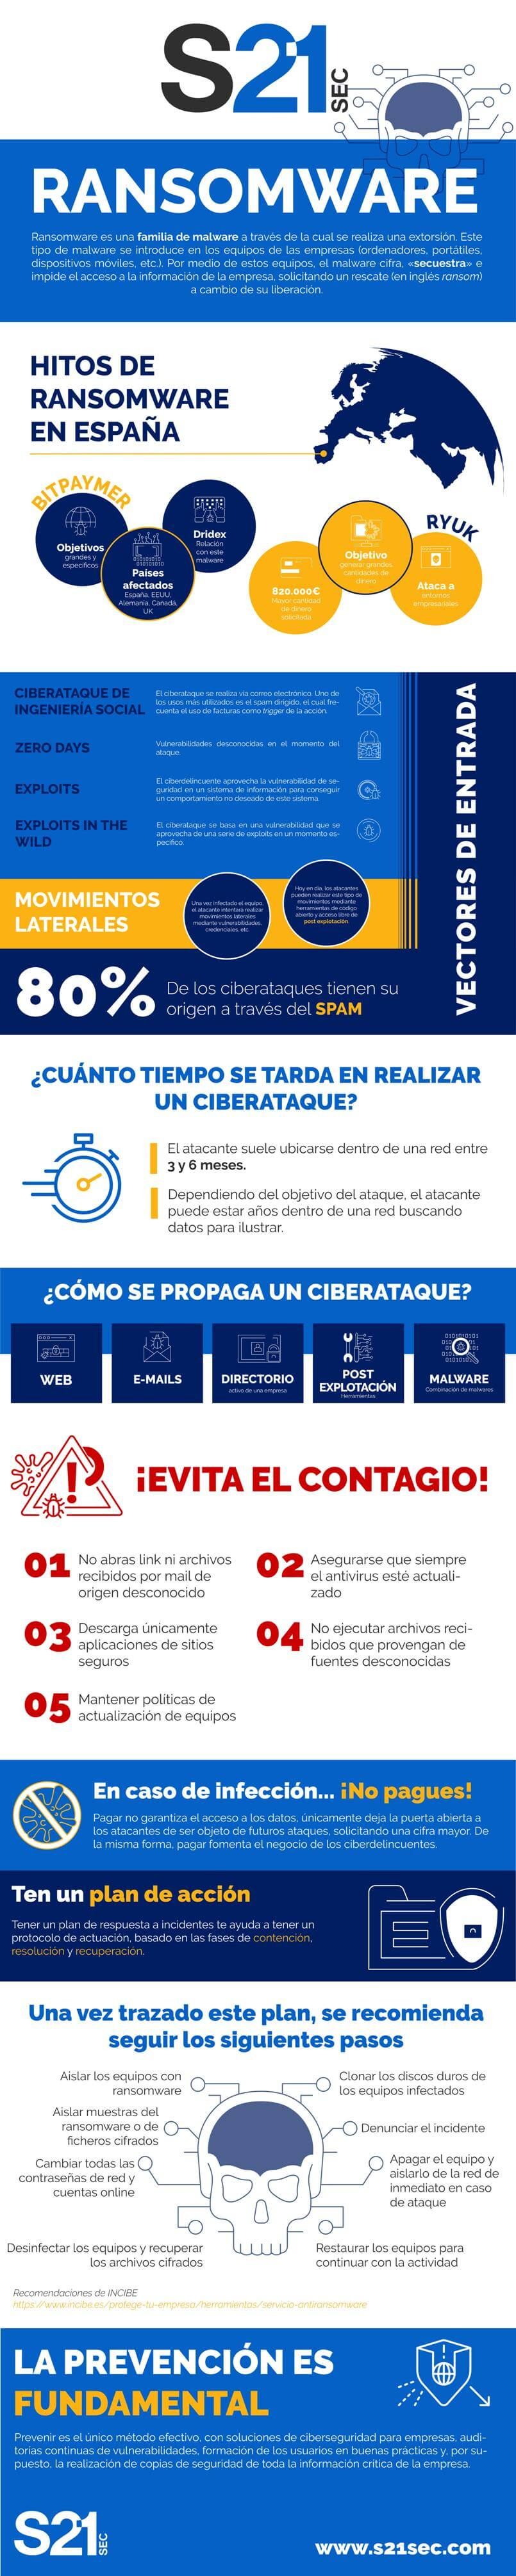 infografia_ransomware